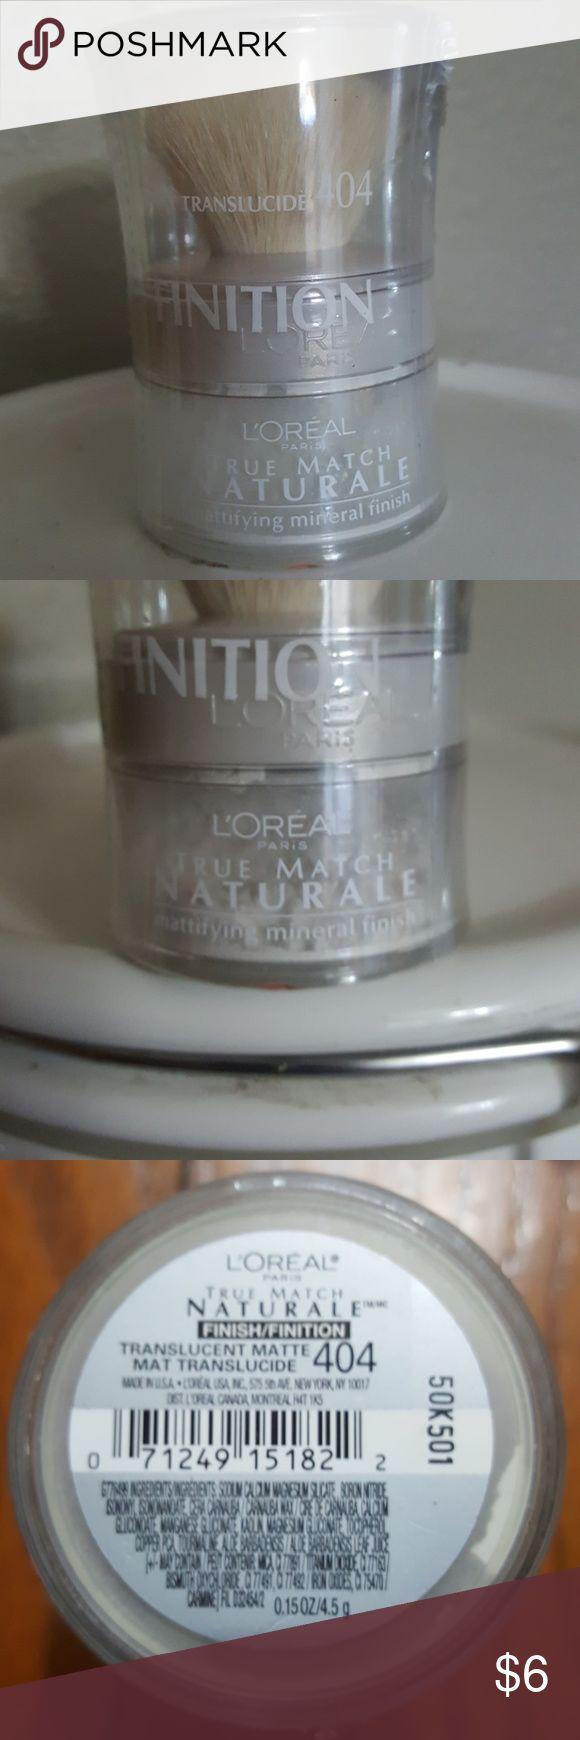 L'Oreal Paris True Match Powder NWOT, never opened.  This is L'oreal Paris true match naturale mattifying mineral finish matte translucide 404.  It is still factory sealed. L'Oreal Makeup Face Powder